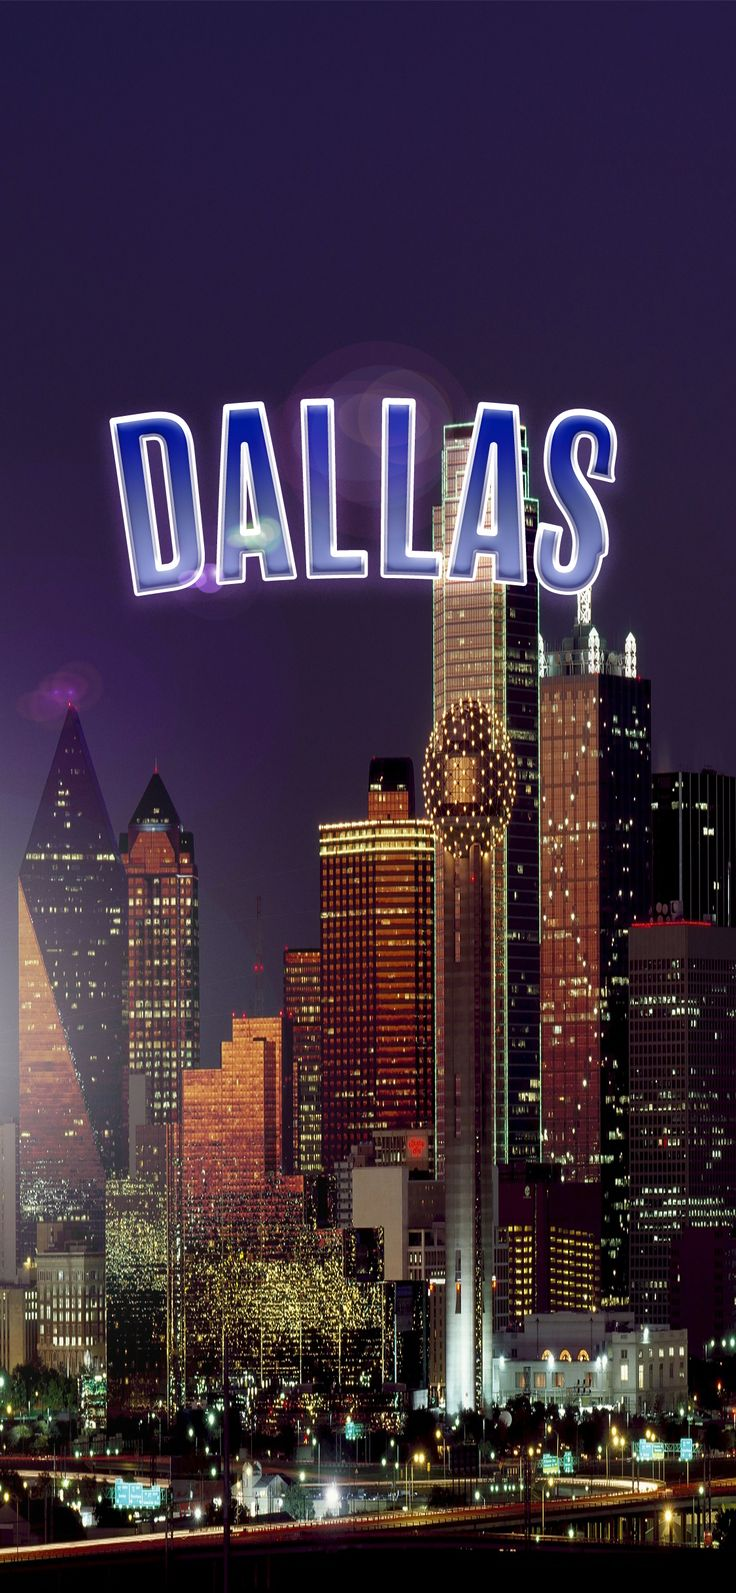 Dallas IPhone Wallpaper in 2020 Design, Iphone wallpaper